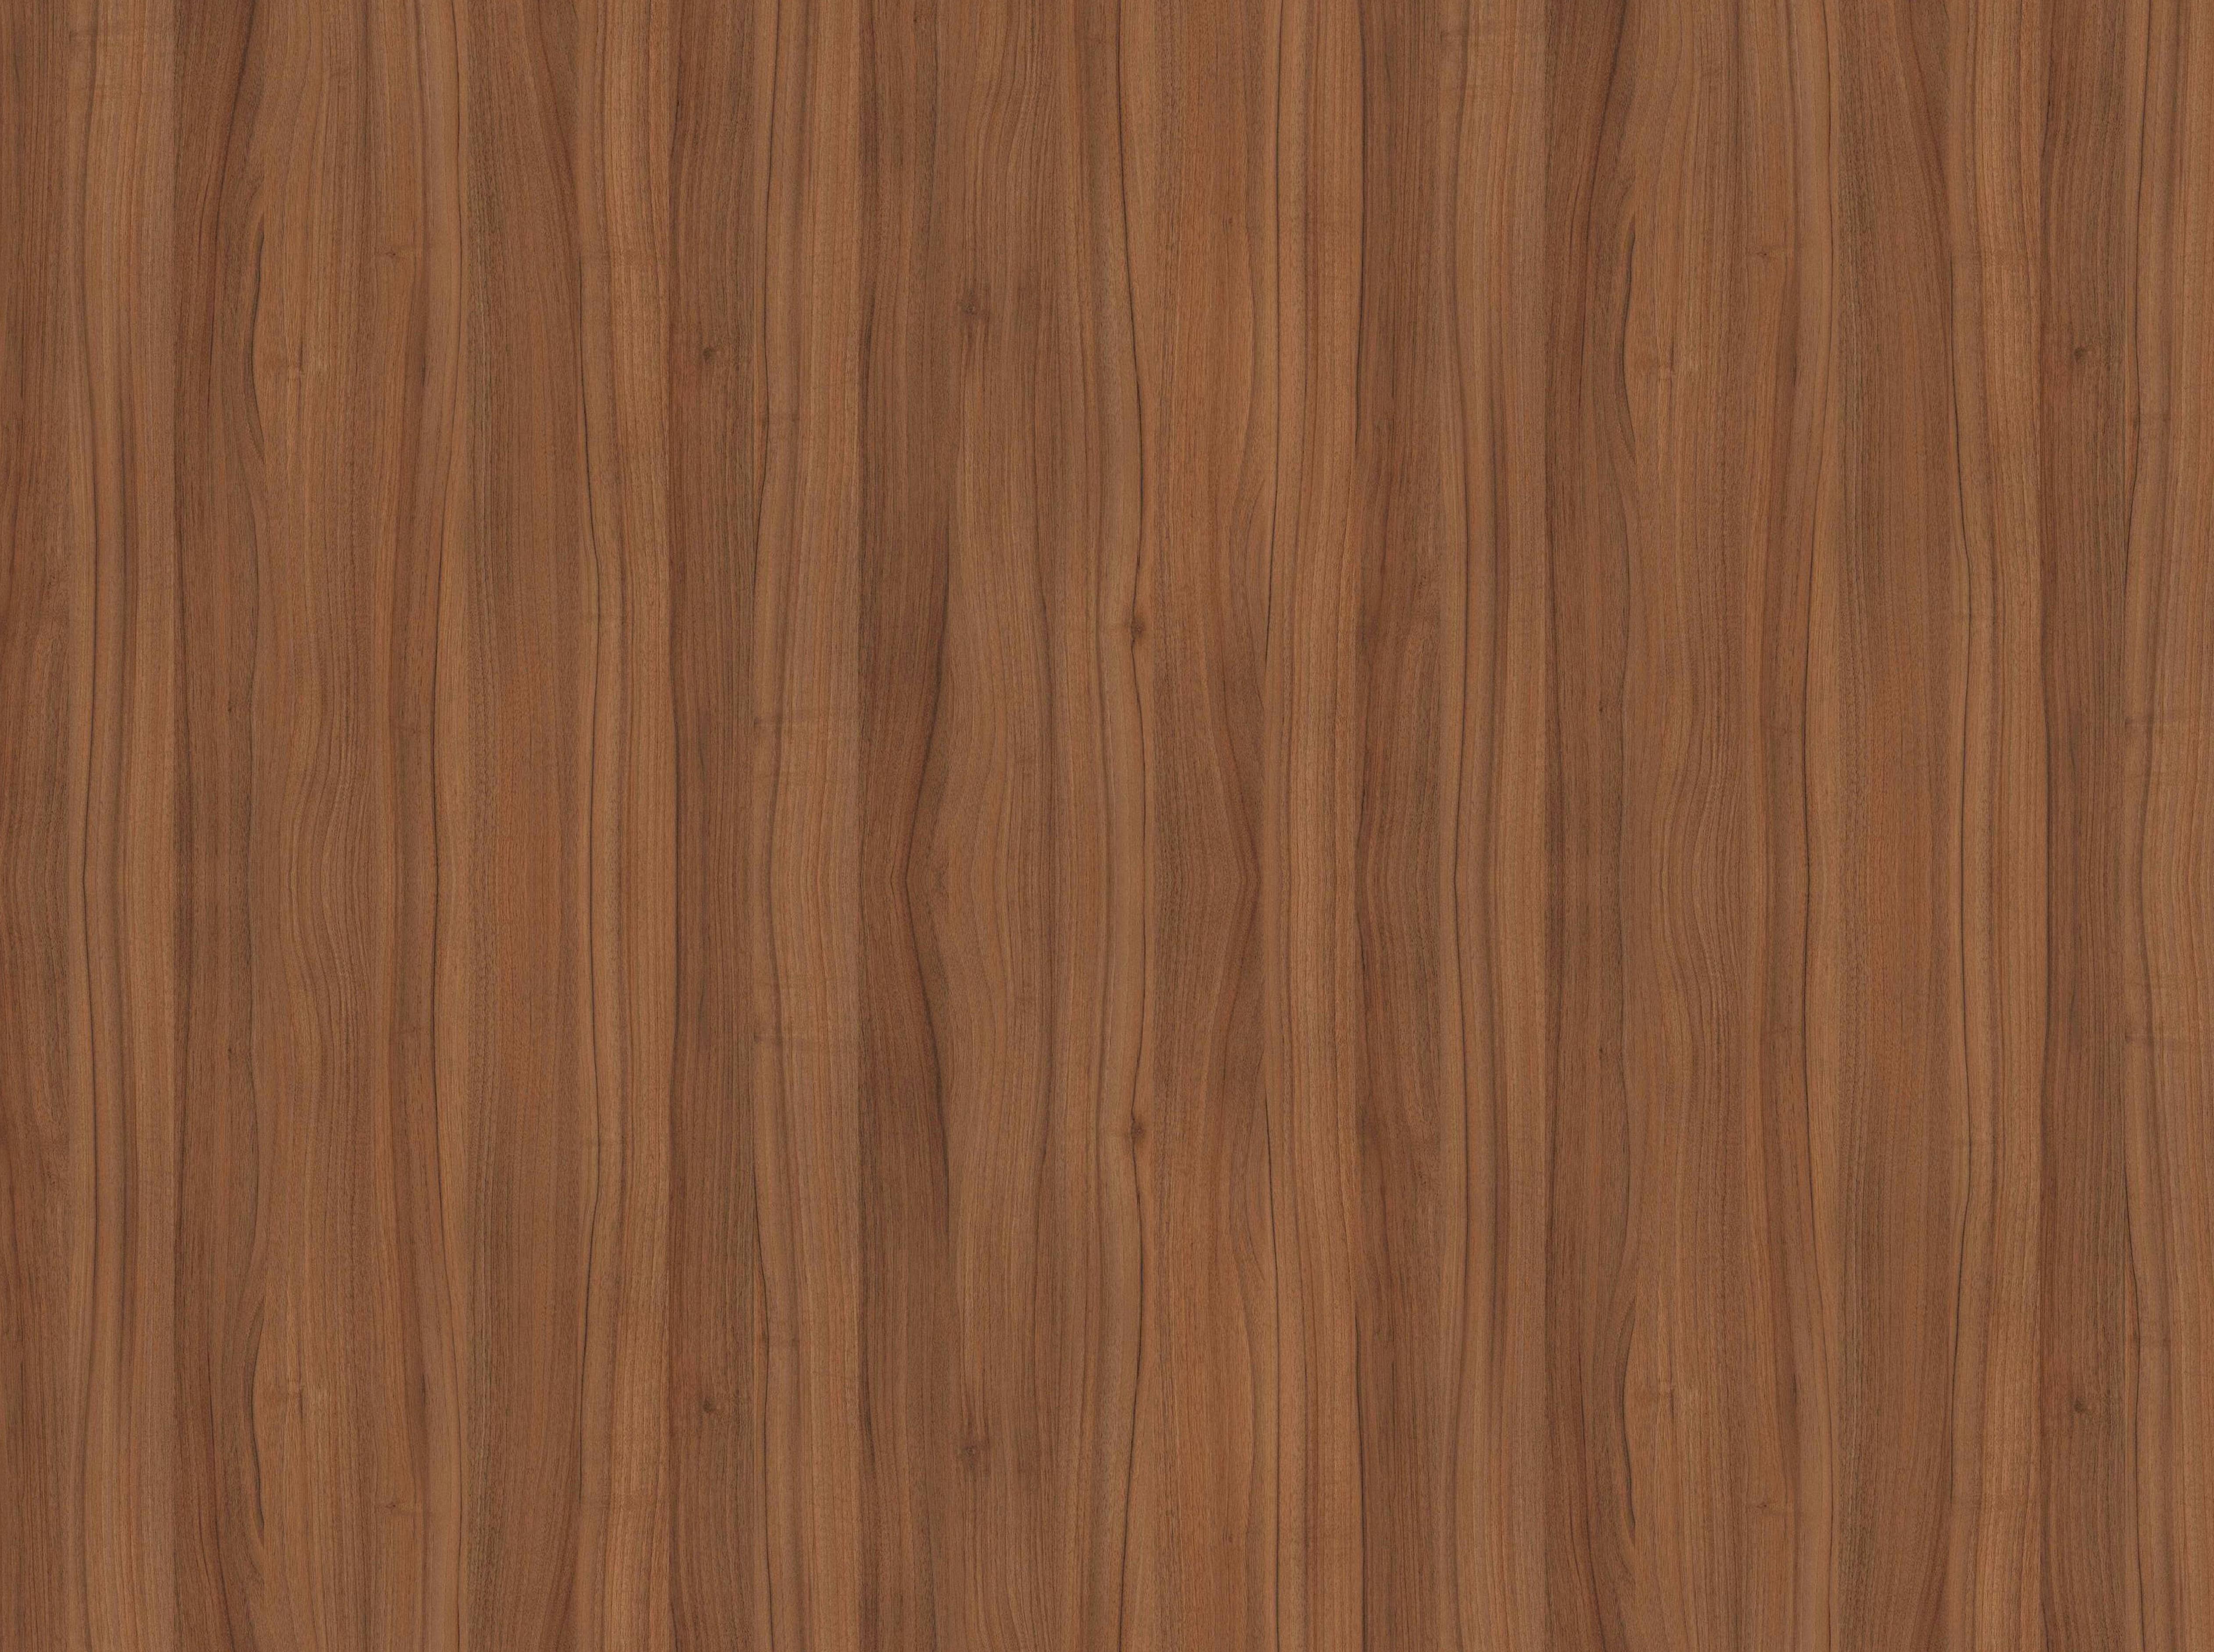 Free photo: Wood Panel Texture - Board, Freetexturefrida ...